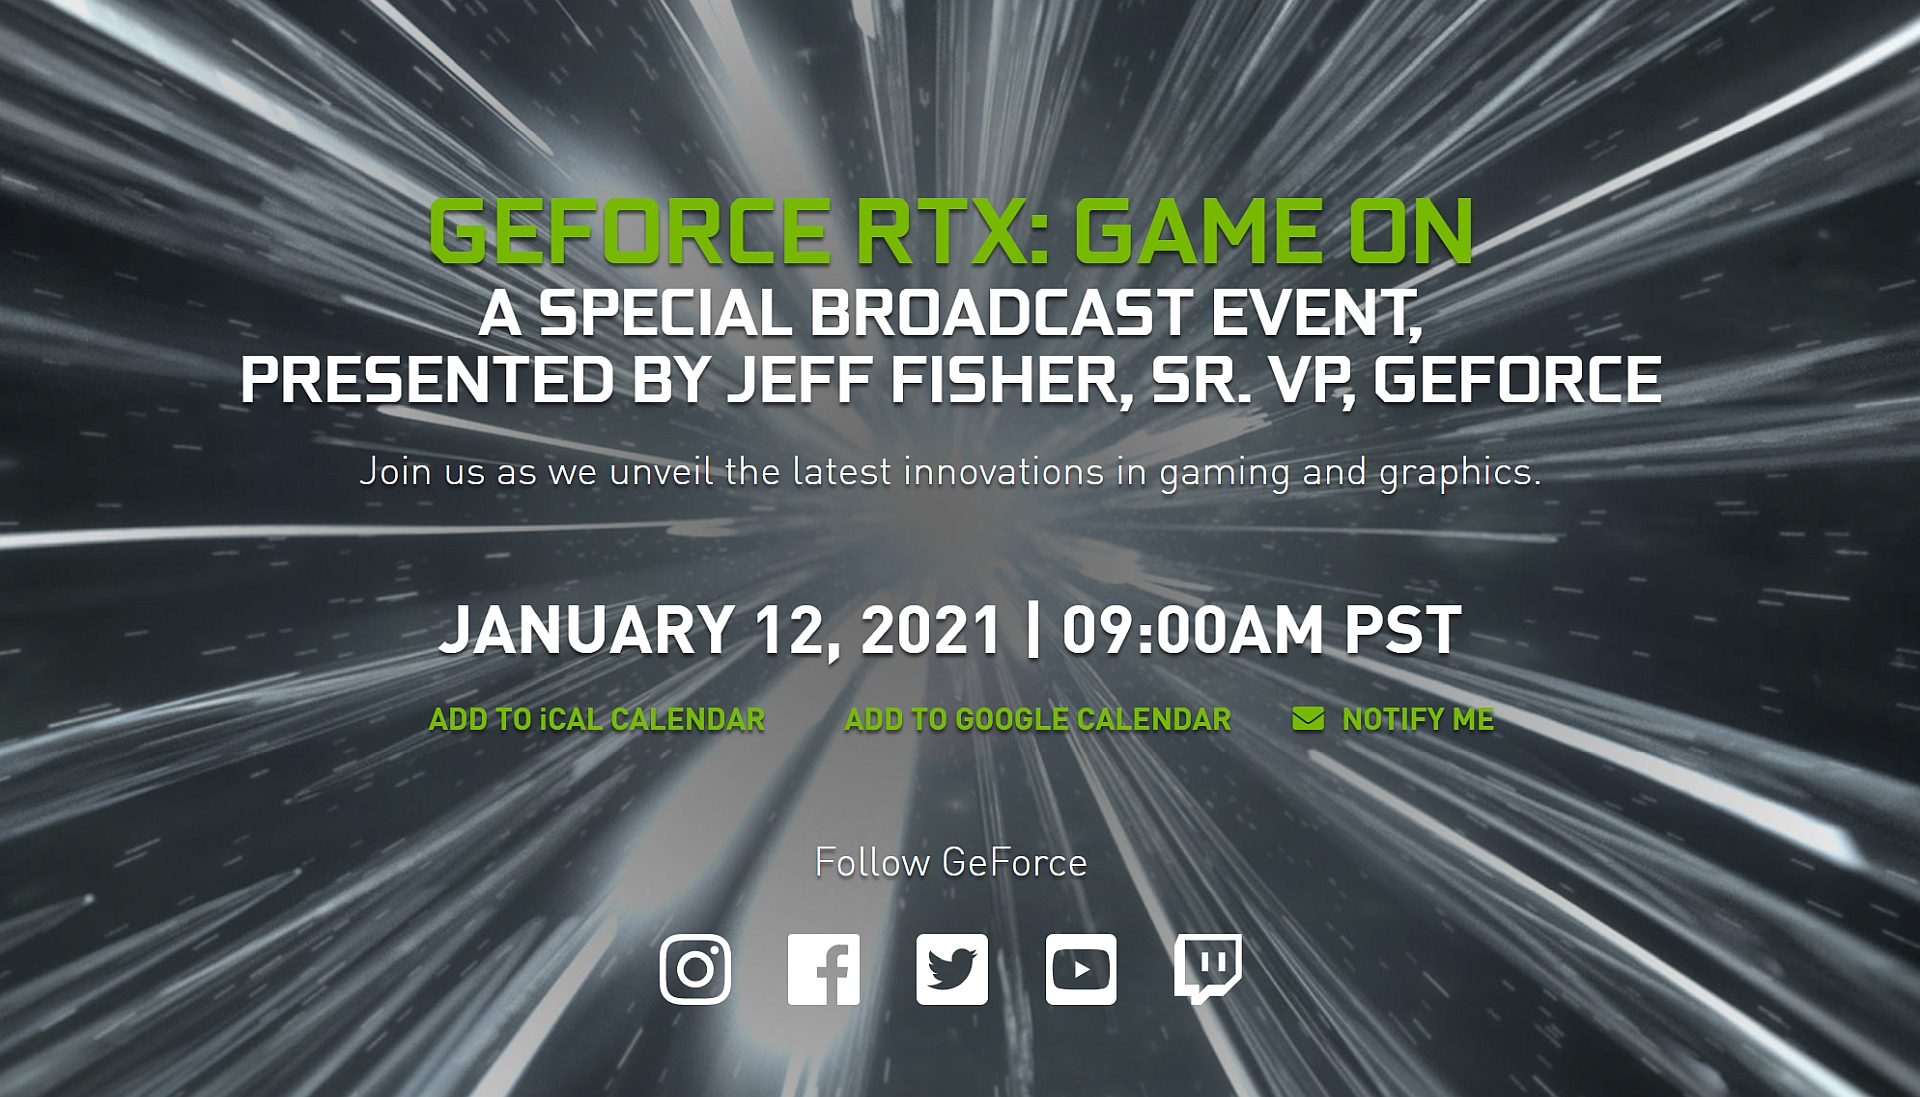 GeForce RTX: Game On